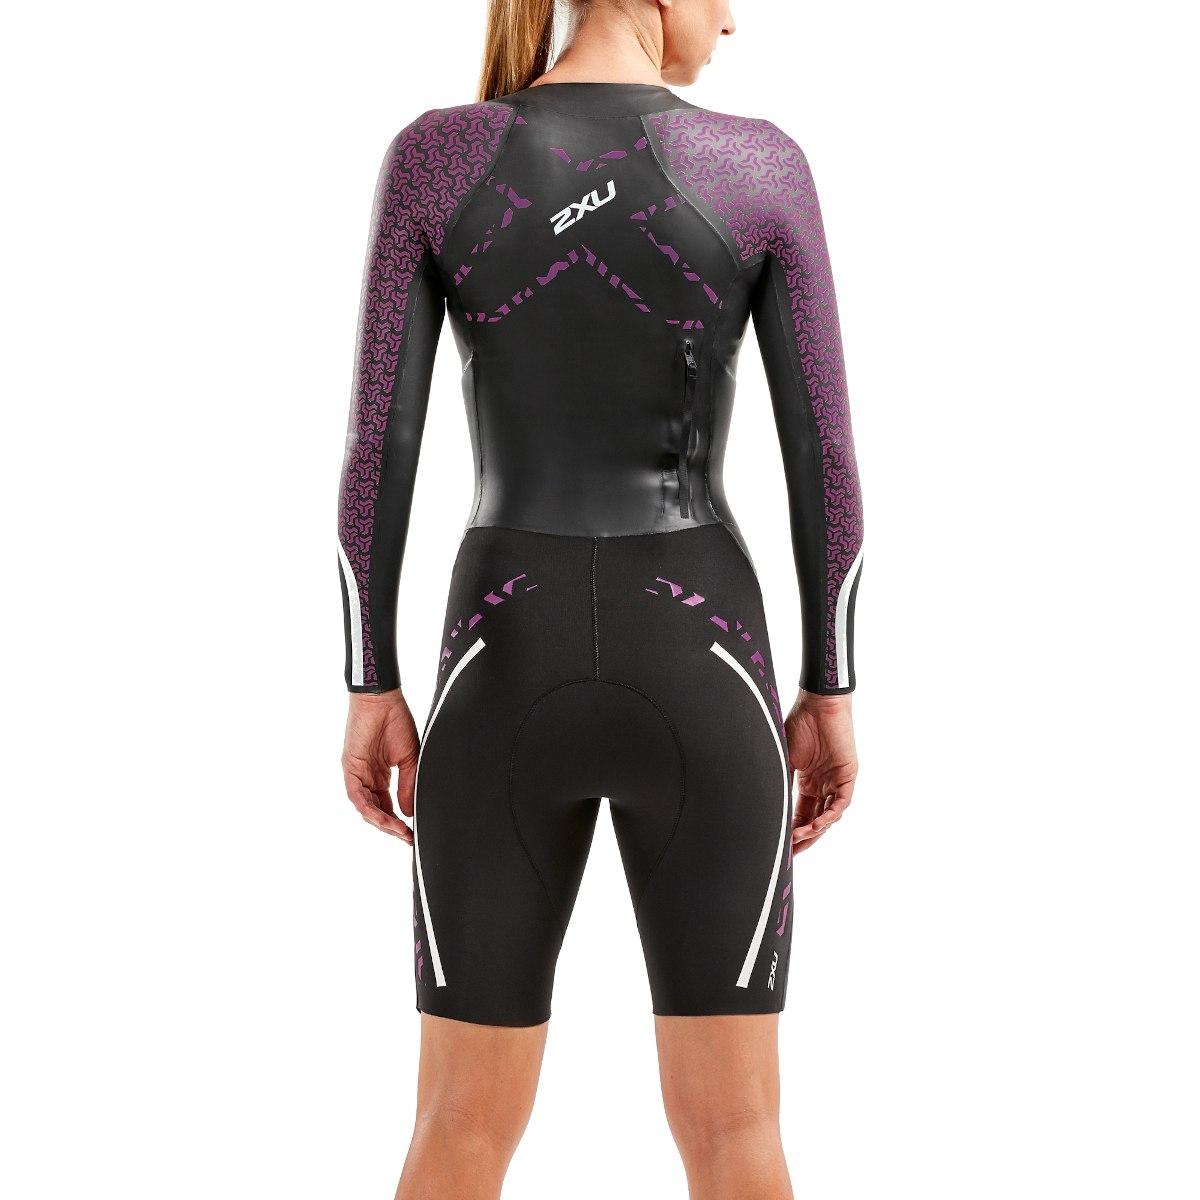 Imagen de 2XU SR:Pro Swimrun Pro Wetsuit - black/very berry